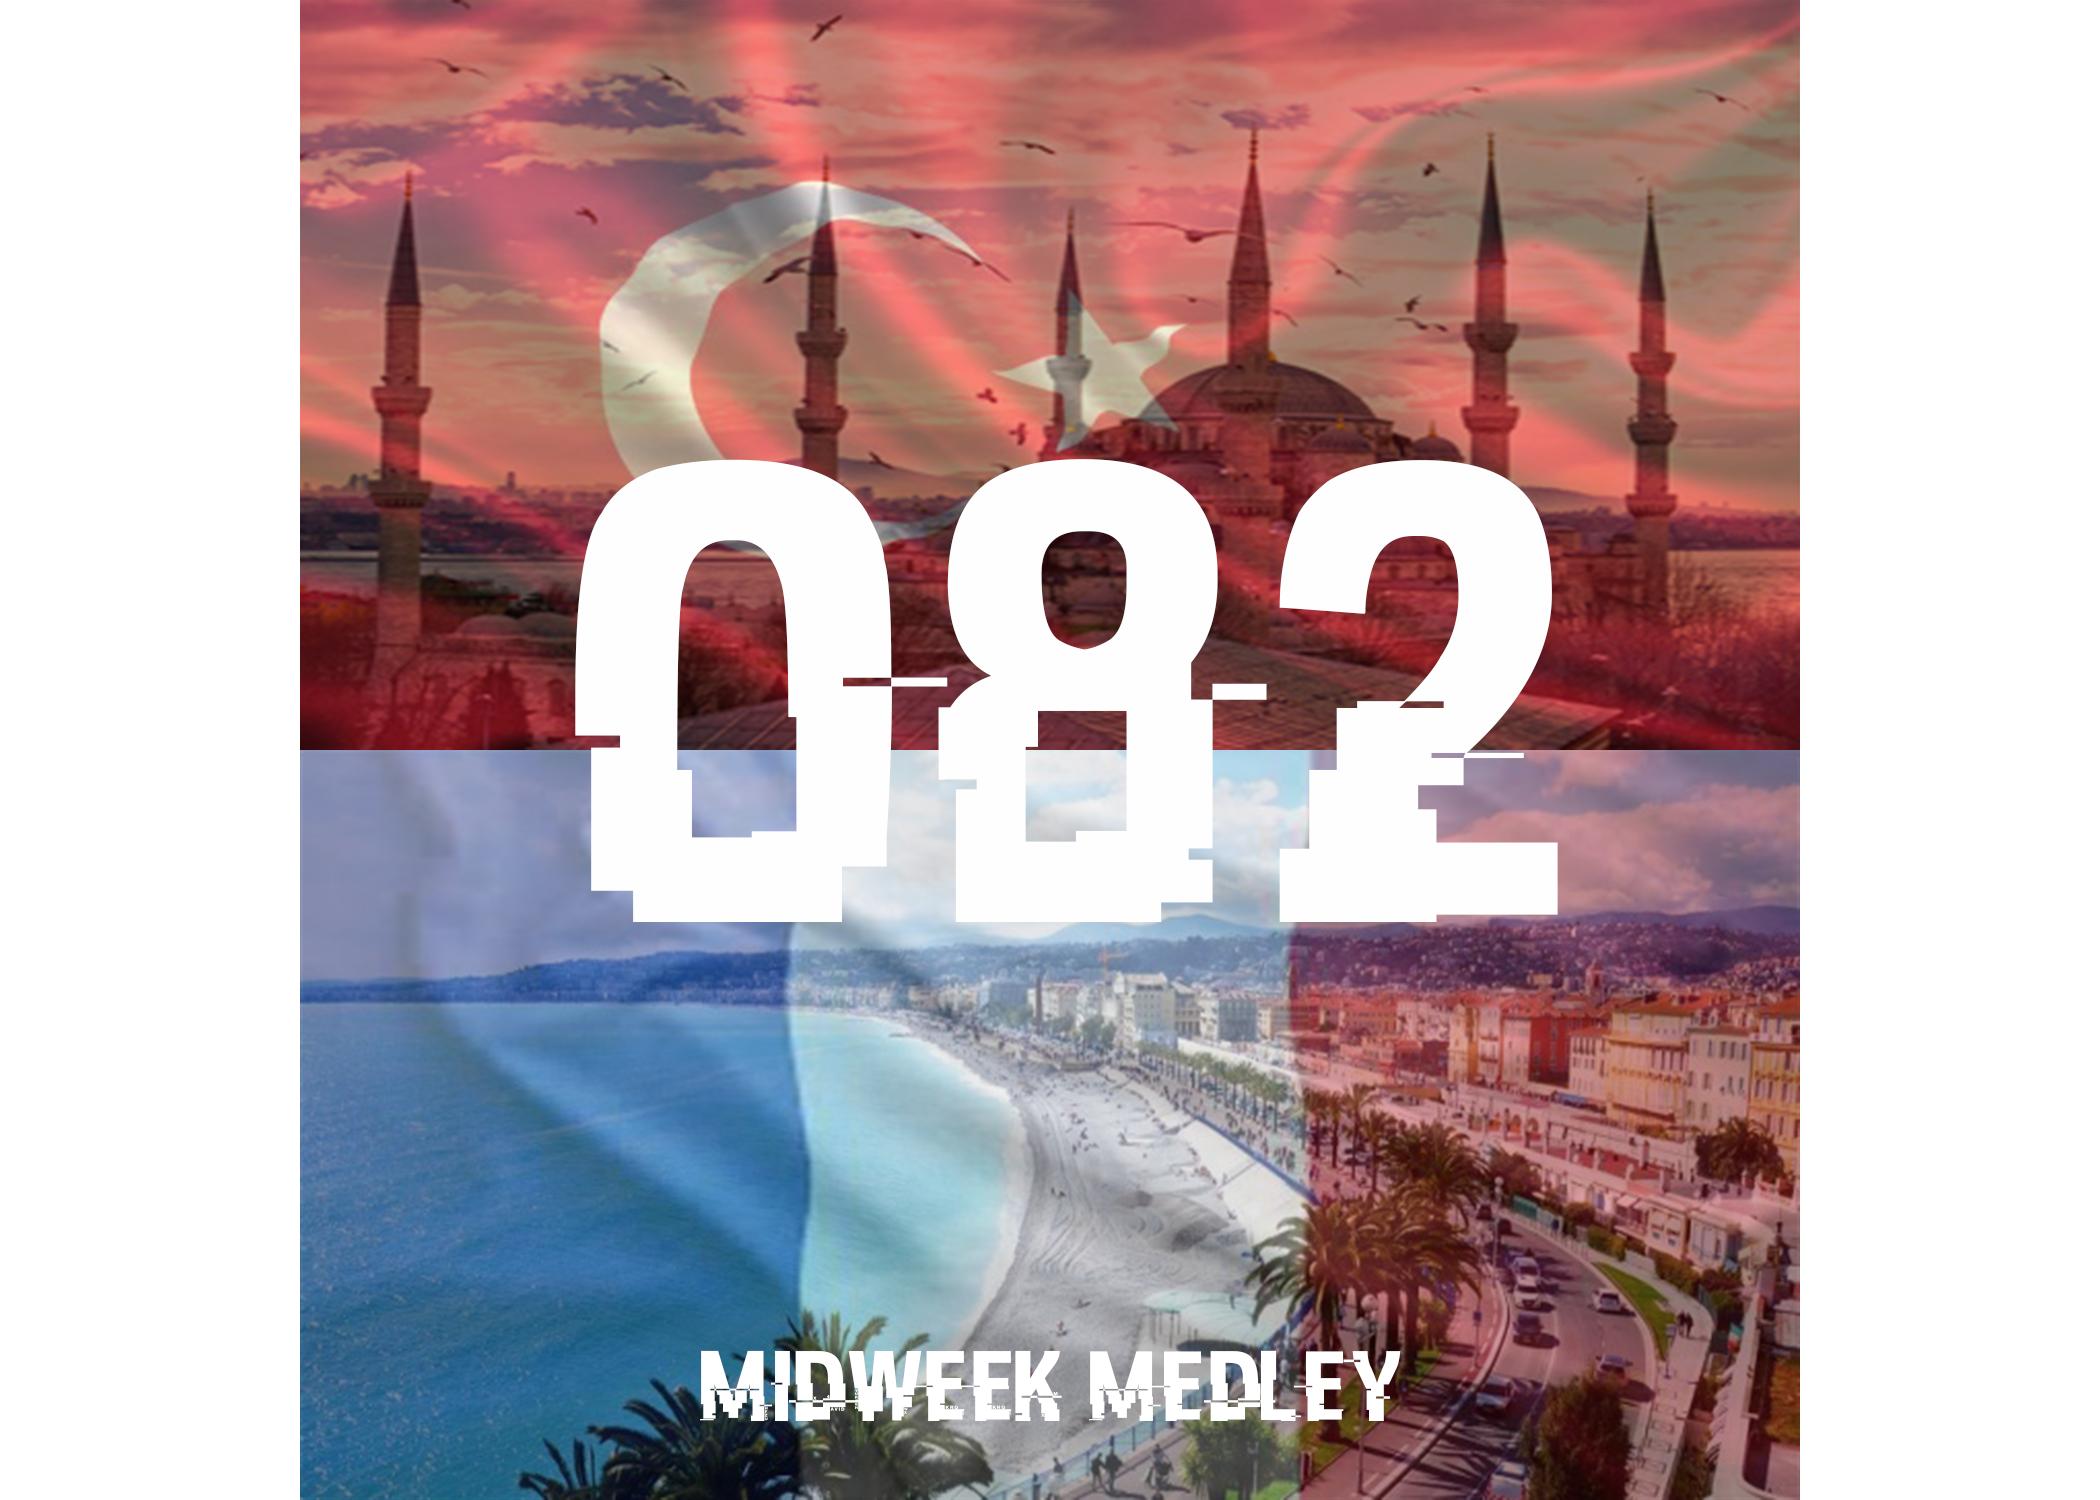 Midweek Medley 082.png